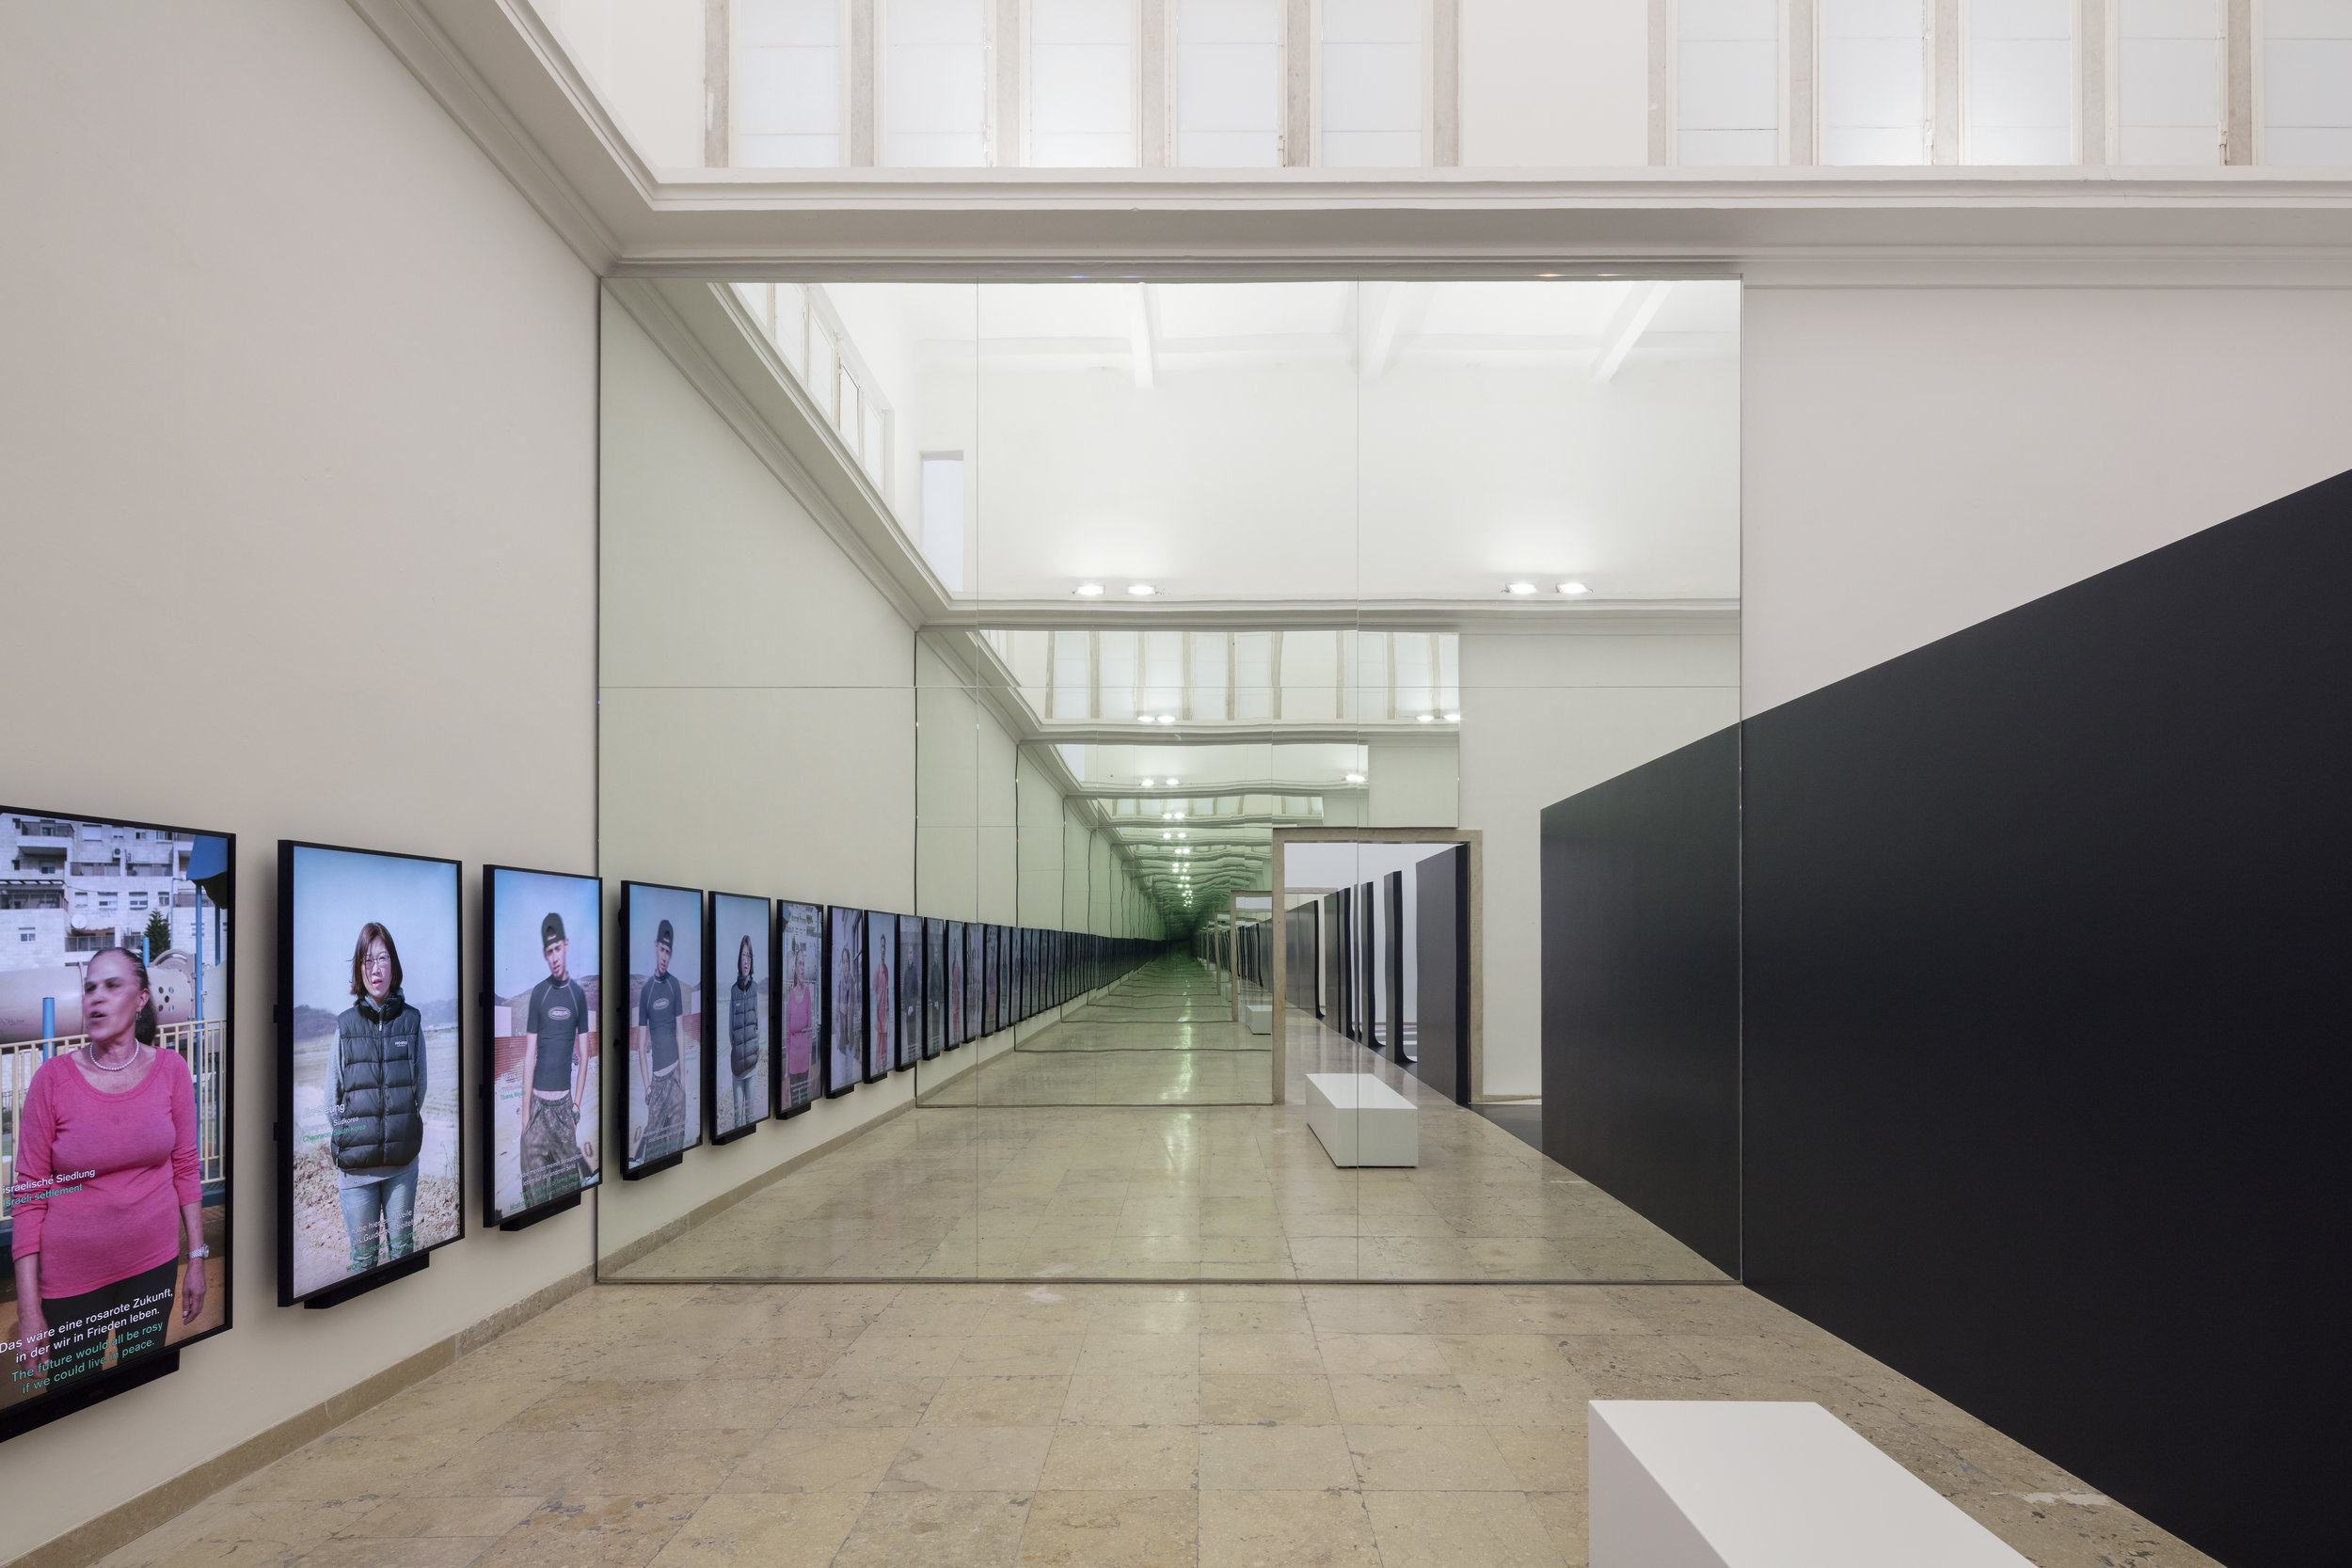 08_German Pavilion_Biennale Architettura 2018_c_Jan Bitter.jpg